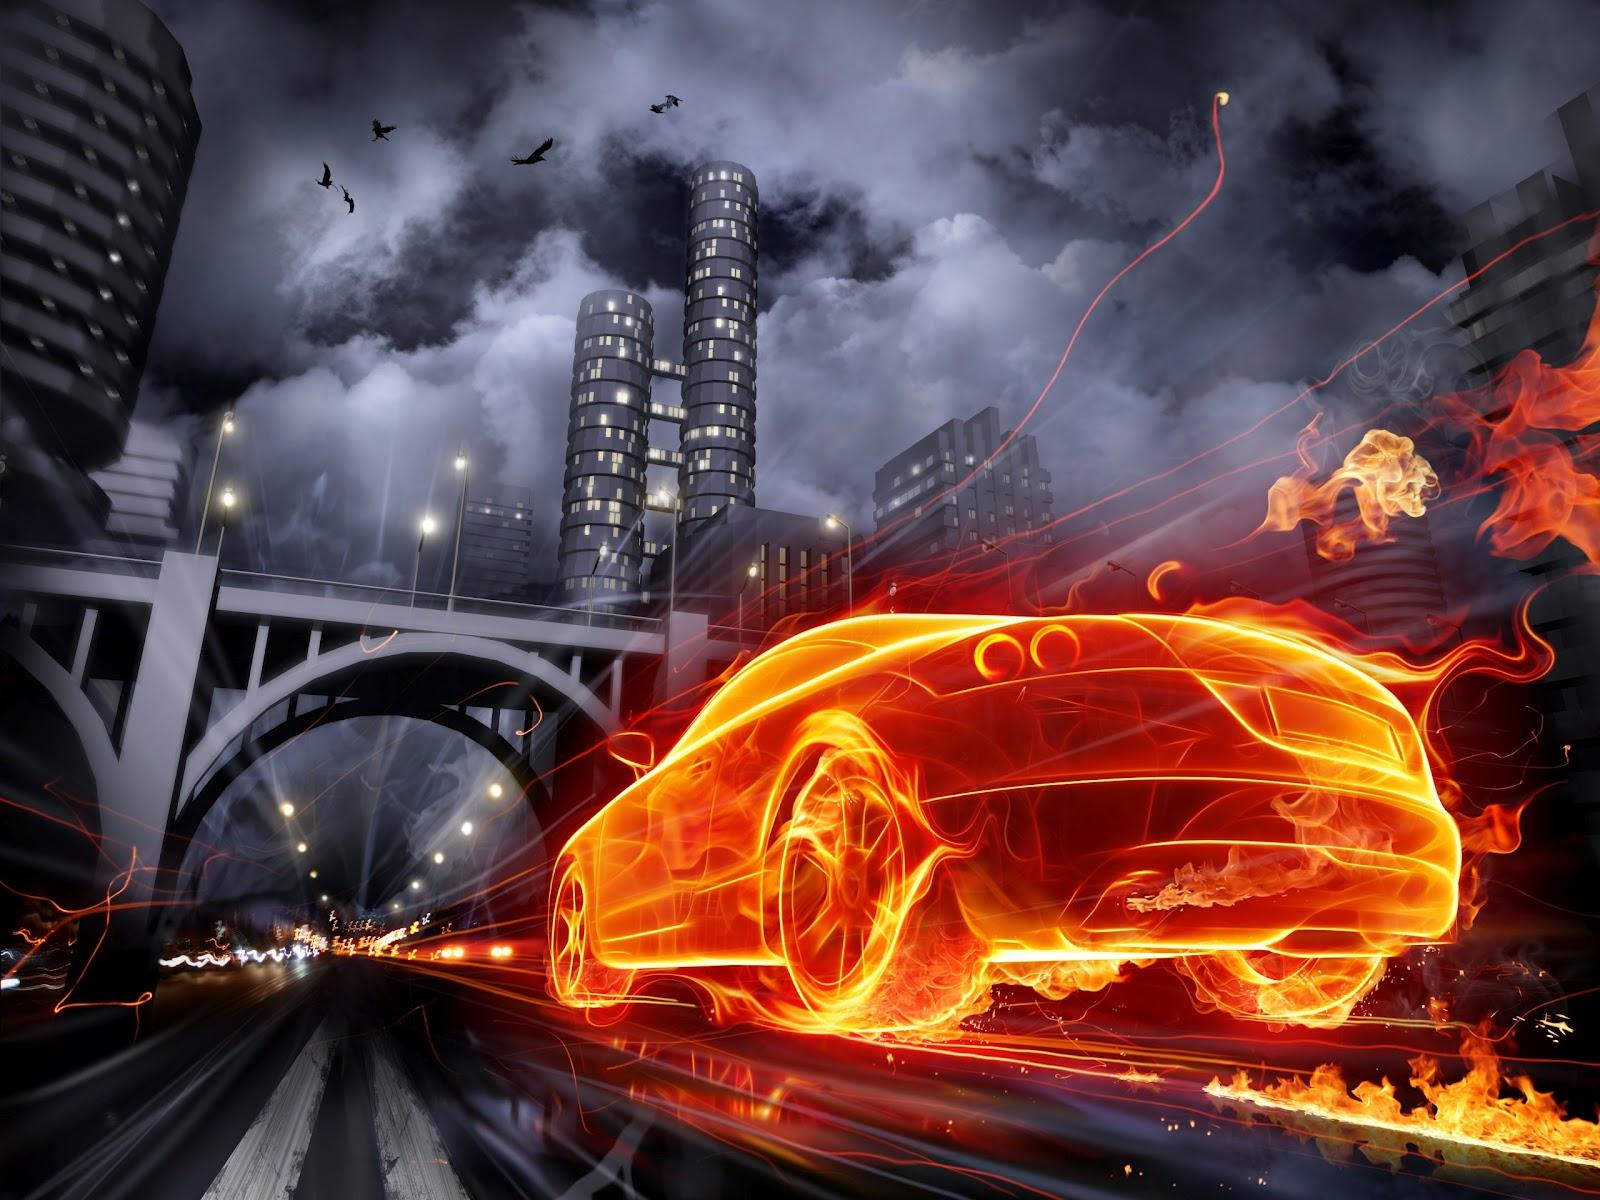 Wallpapers - HD Desktop Wallpapers Free Online: Car Wallpapers